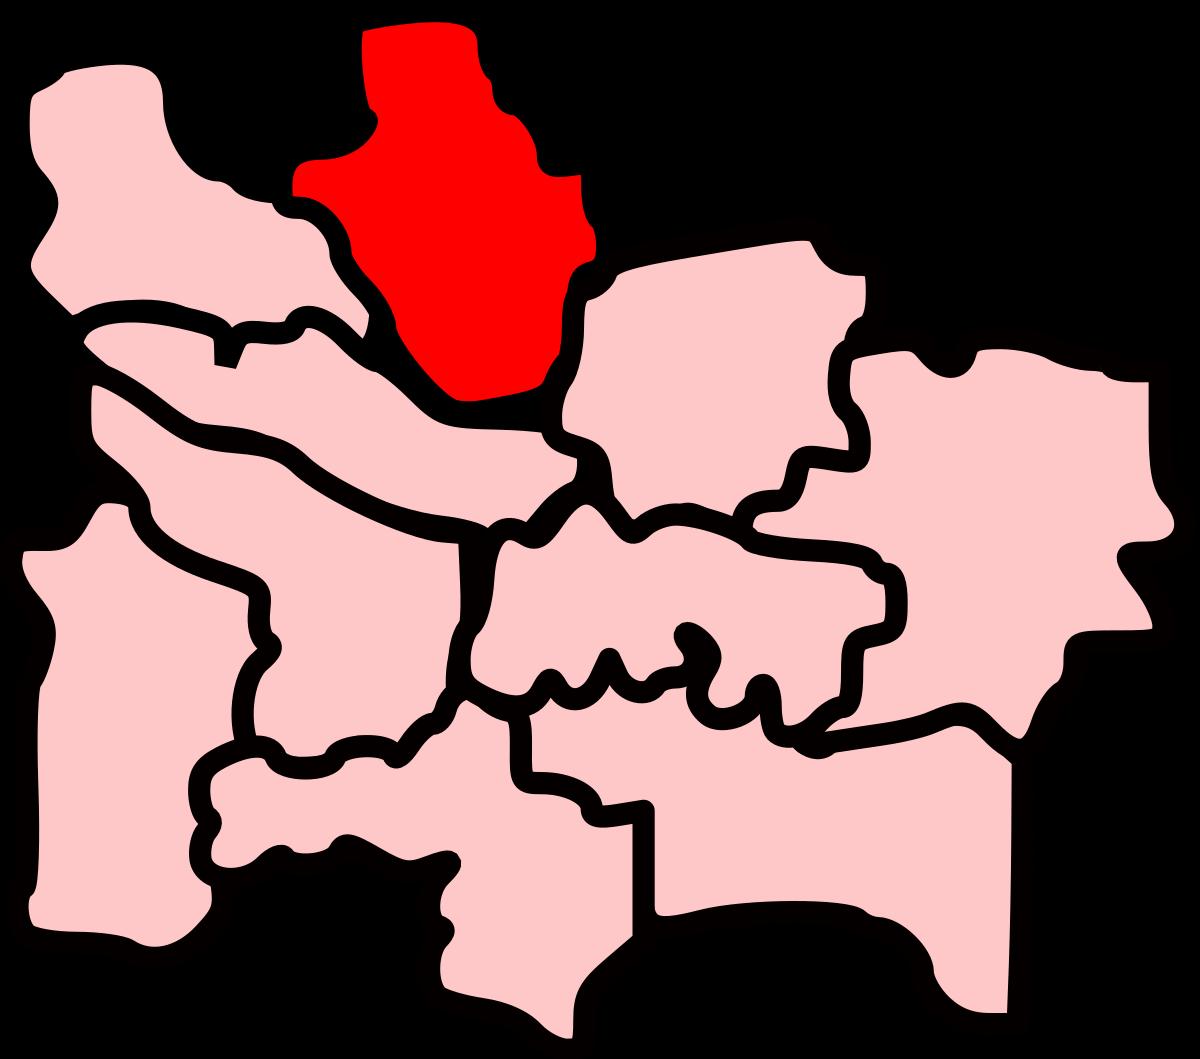 Glasgow Maryhill (Scottish Parliament constituency).